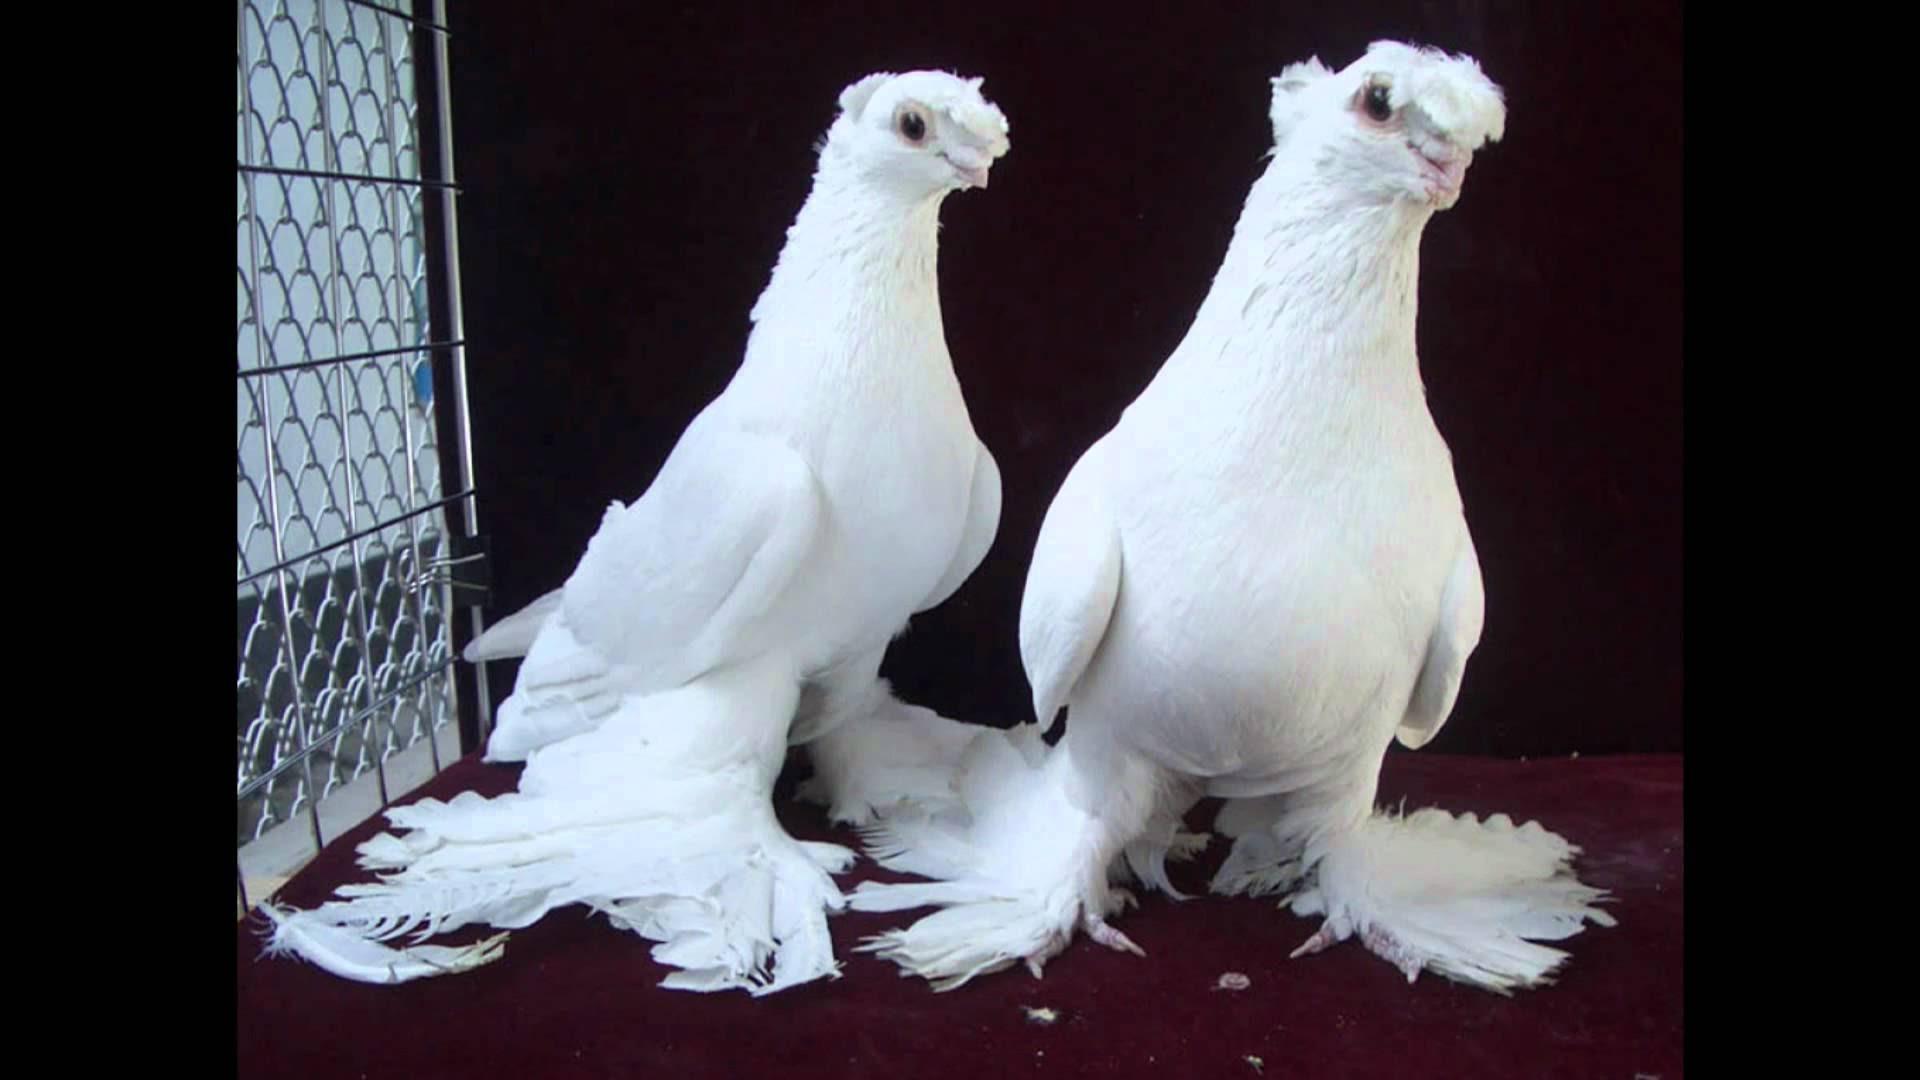 بالصور اجمل حمام , الطائر الجميل و انواعه 5338 6